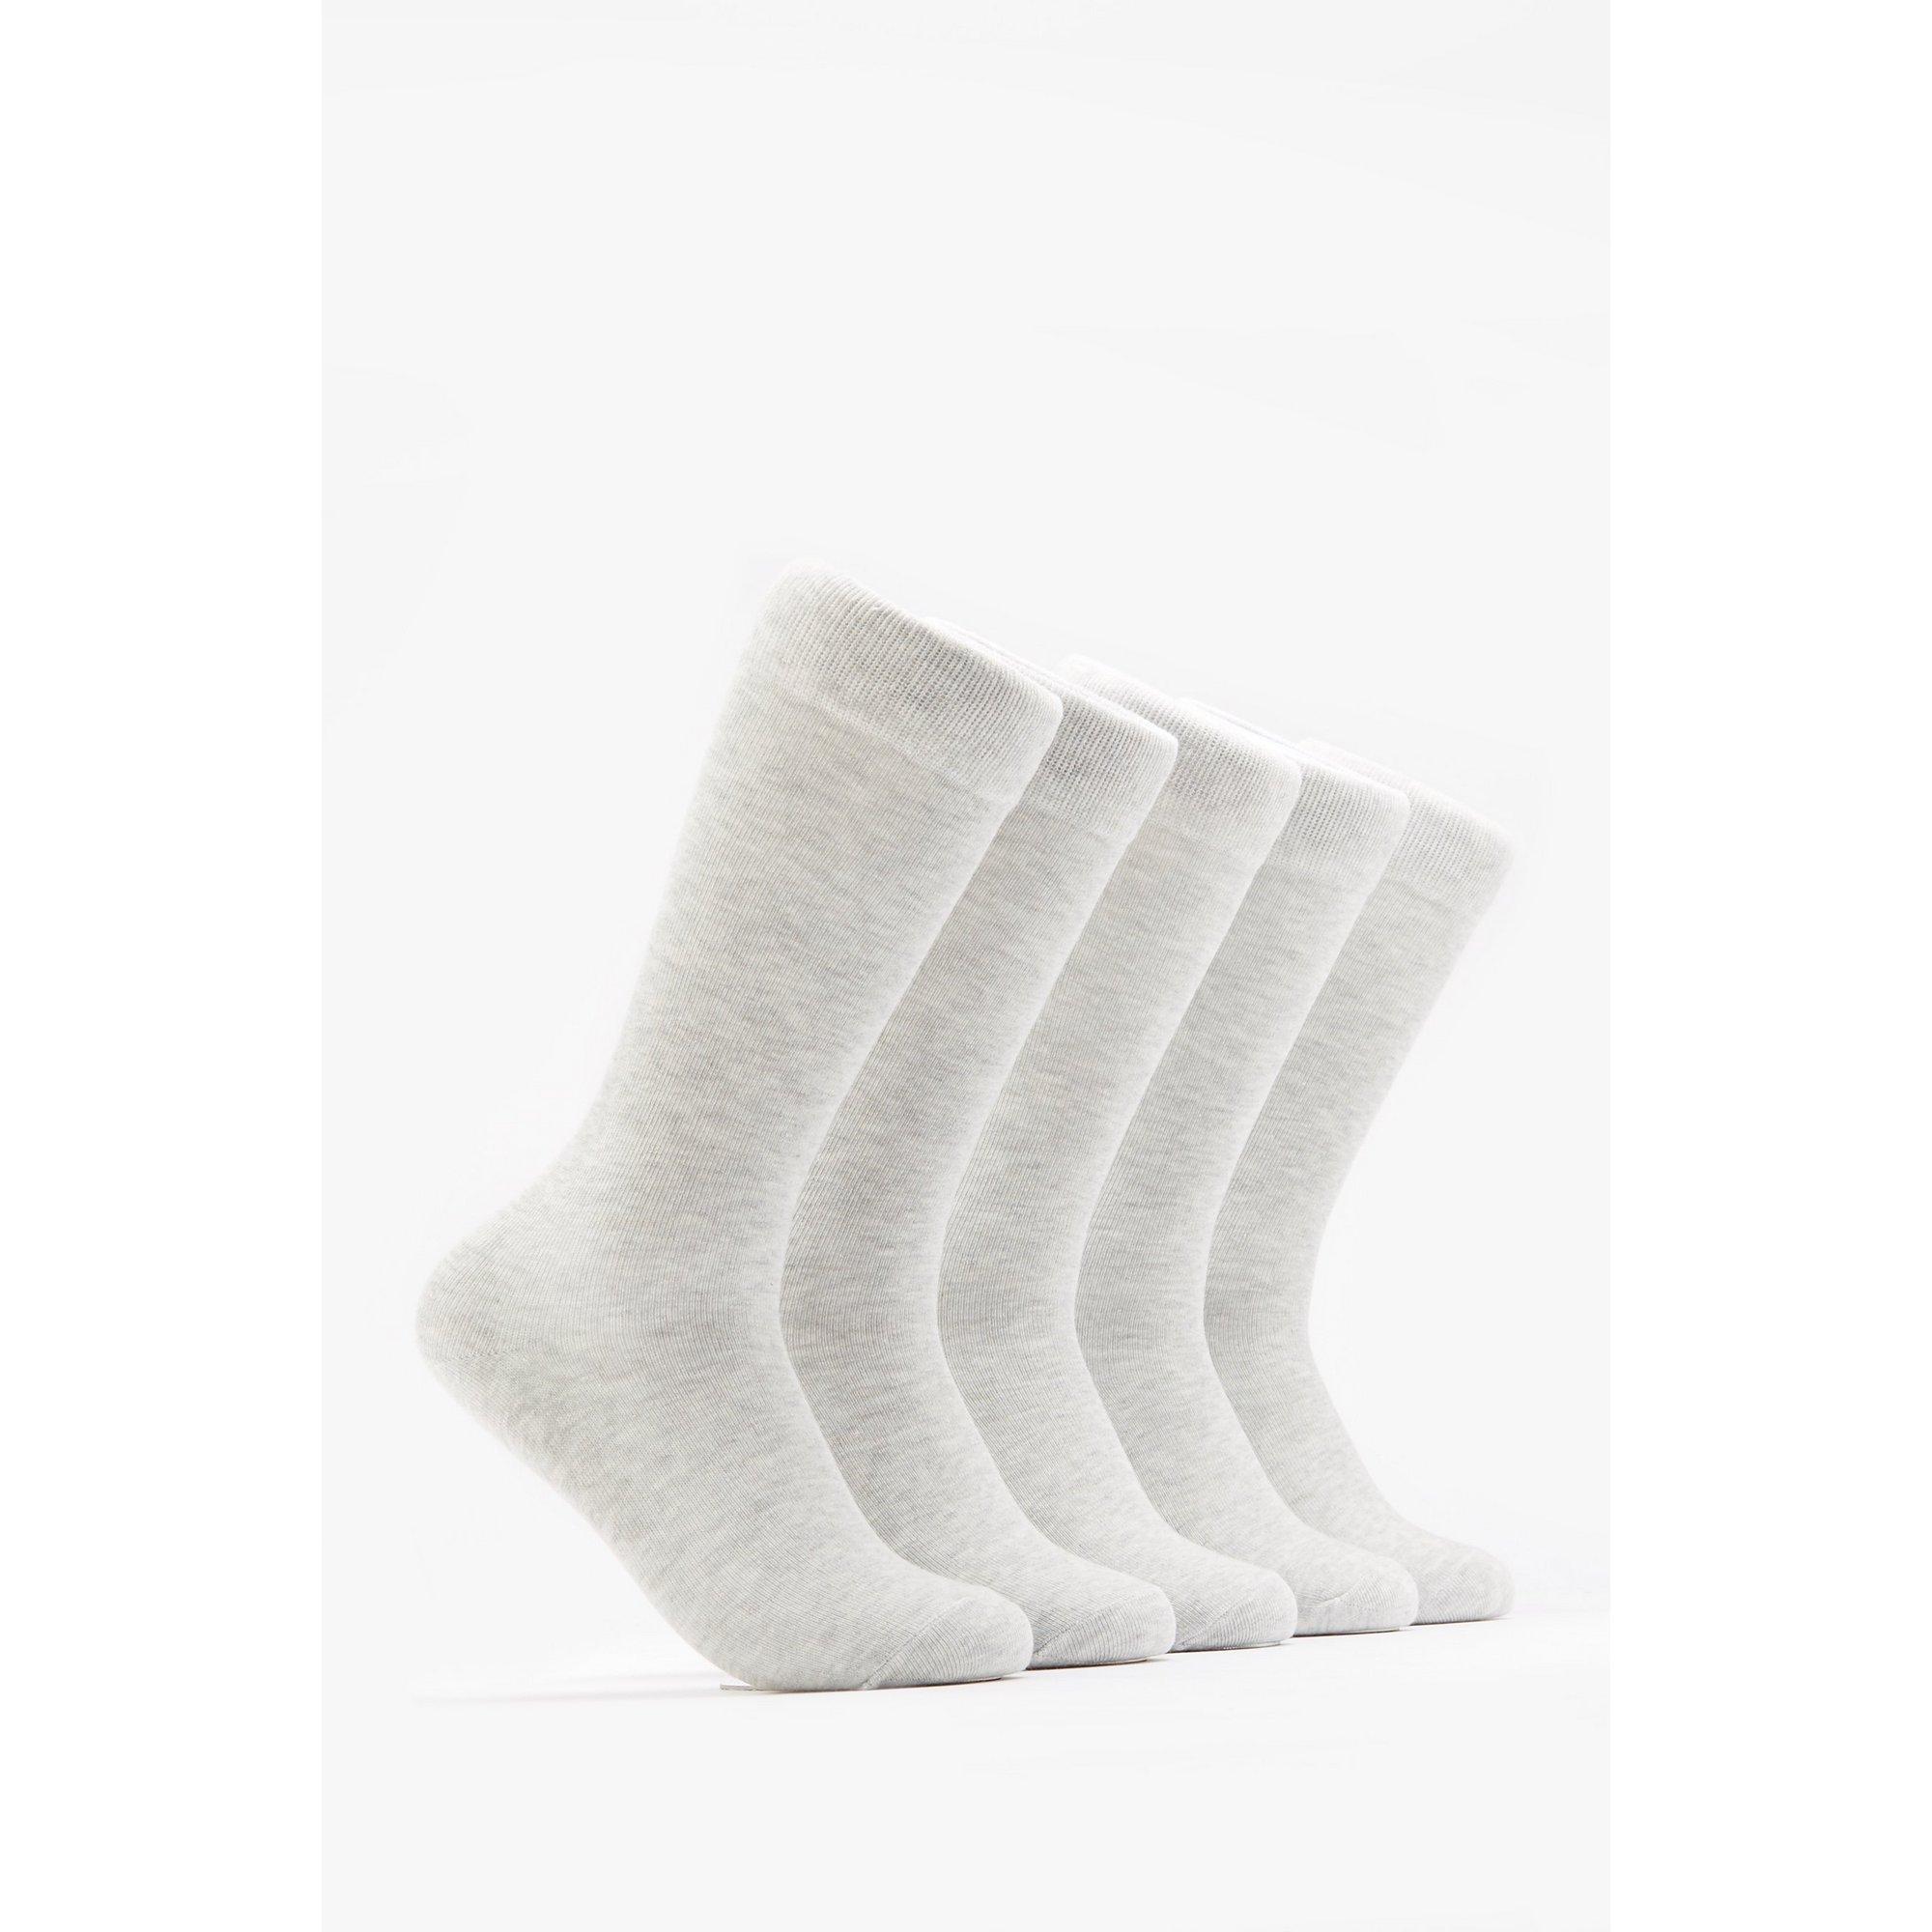 Image of Girls Pack of 5 Grey Knee High Socks